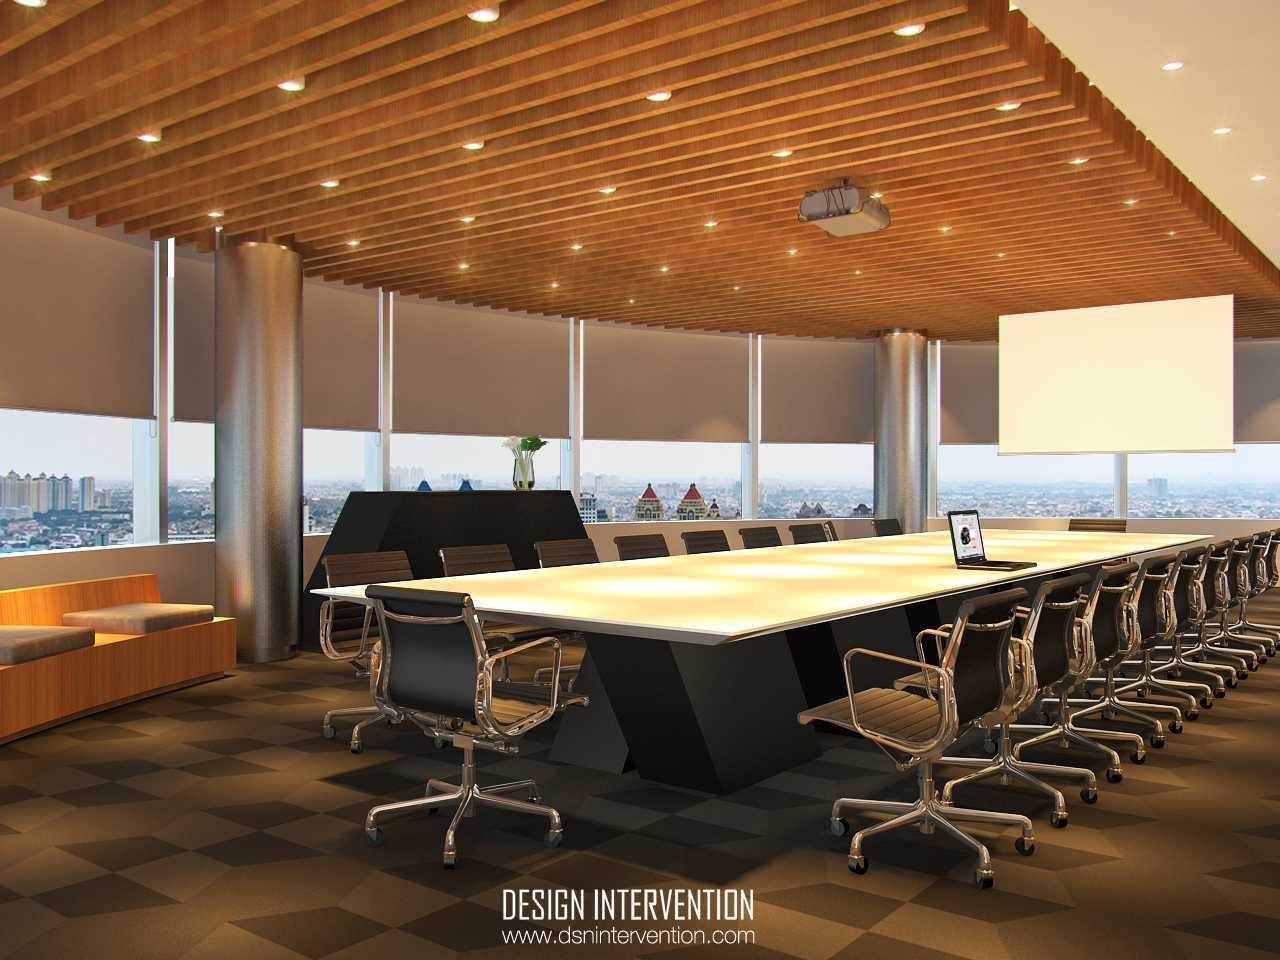 Design Intervention Mitsubishi Hq Office Tebet Tebet Meeting-Room-View  14982